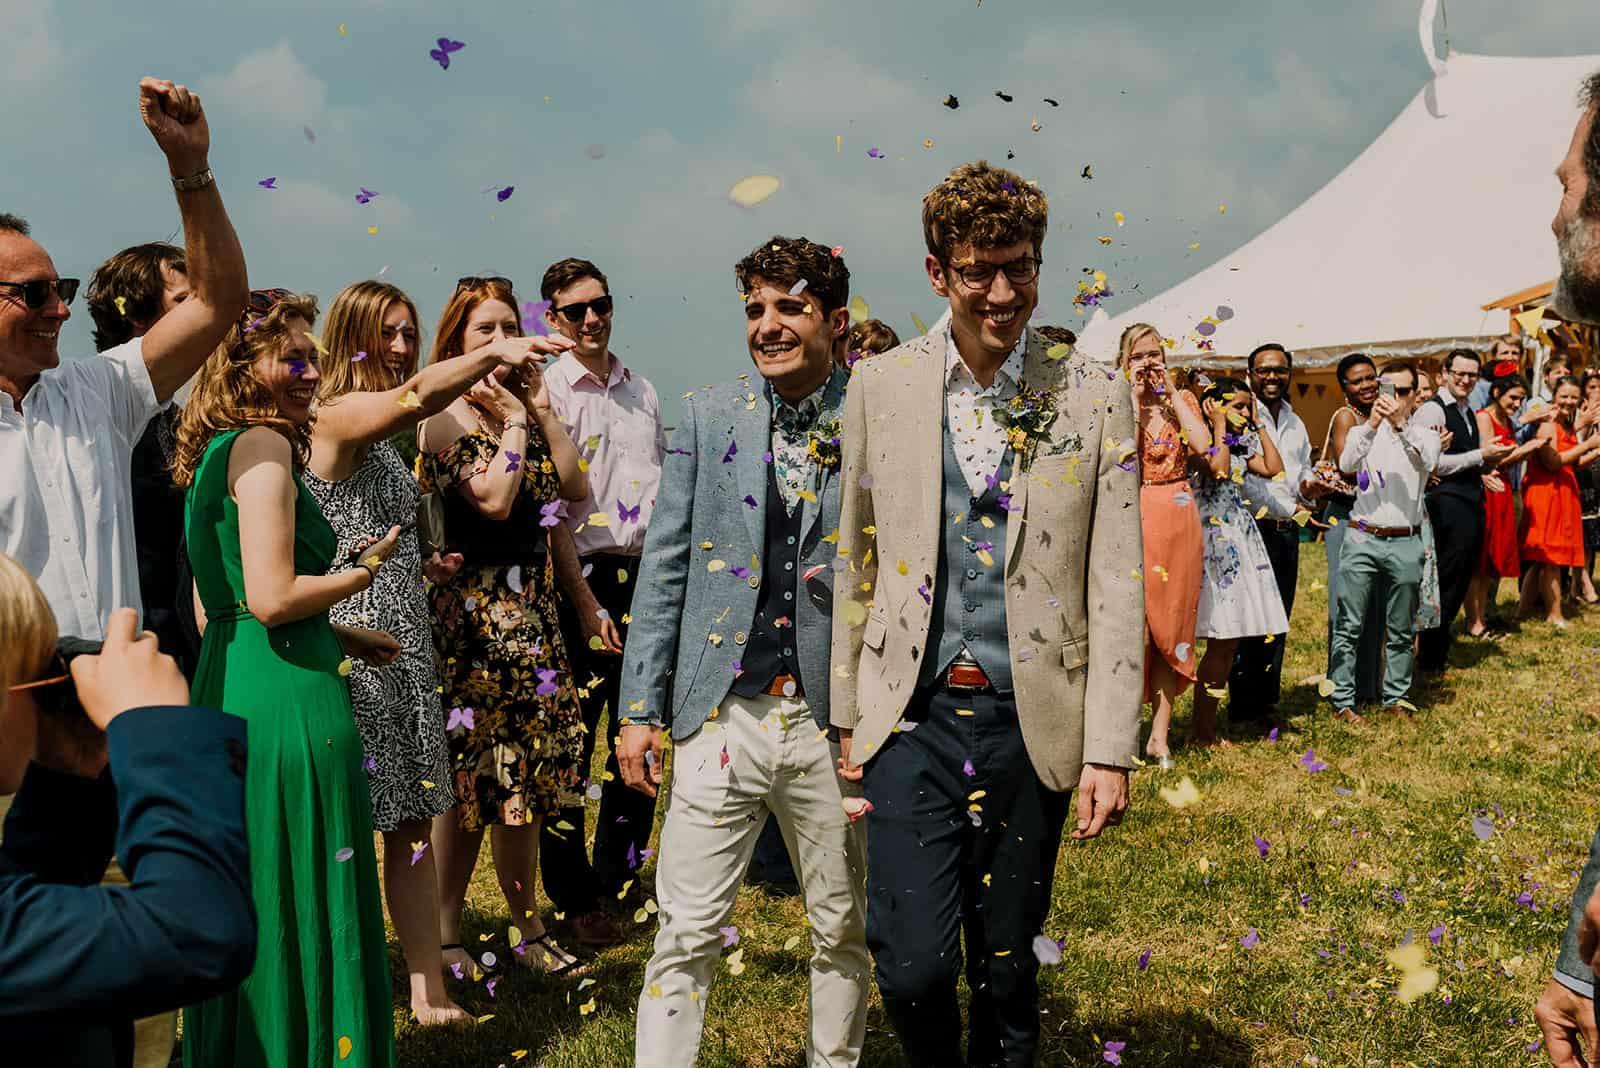 newdowns-farm-wedding-photography-let-love-flourish-tom-peter-0017